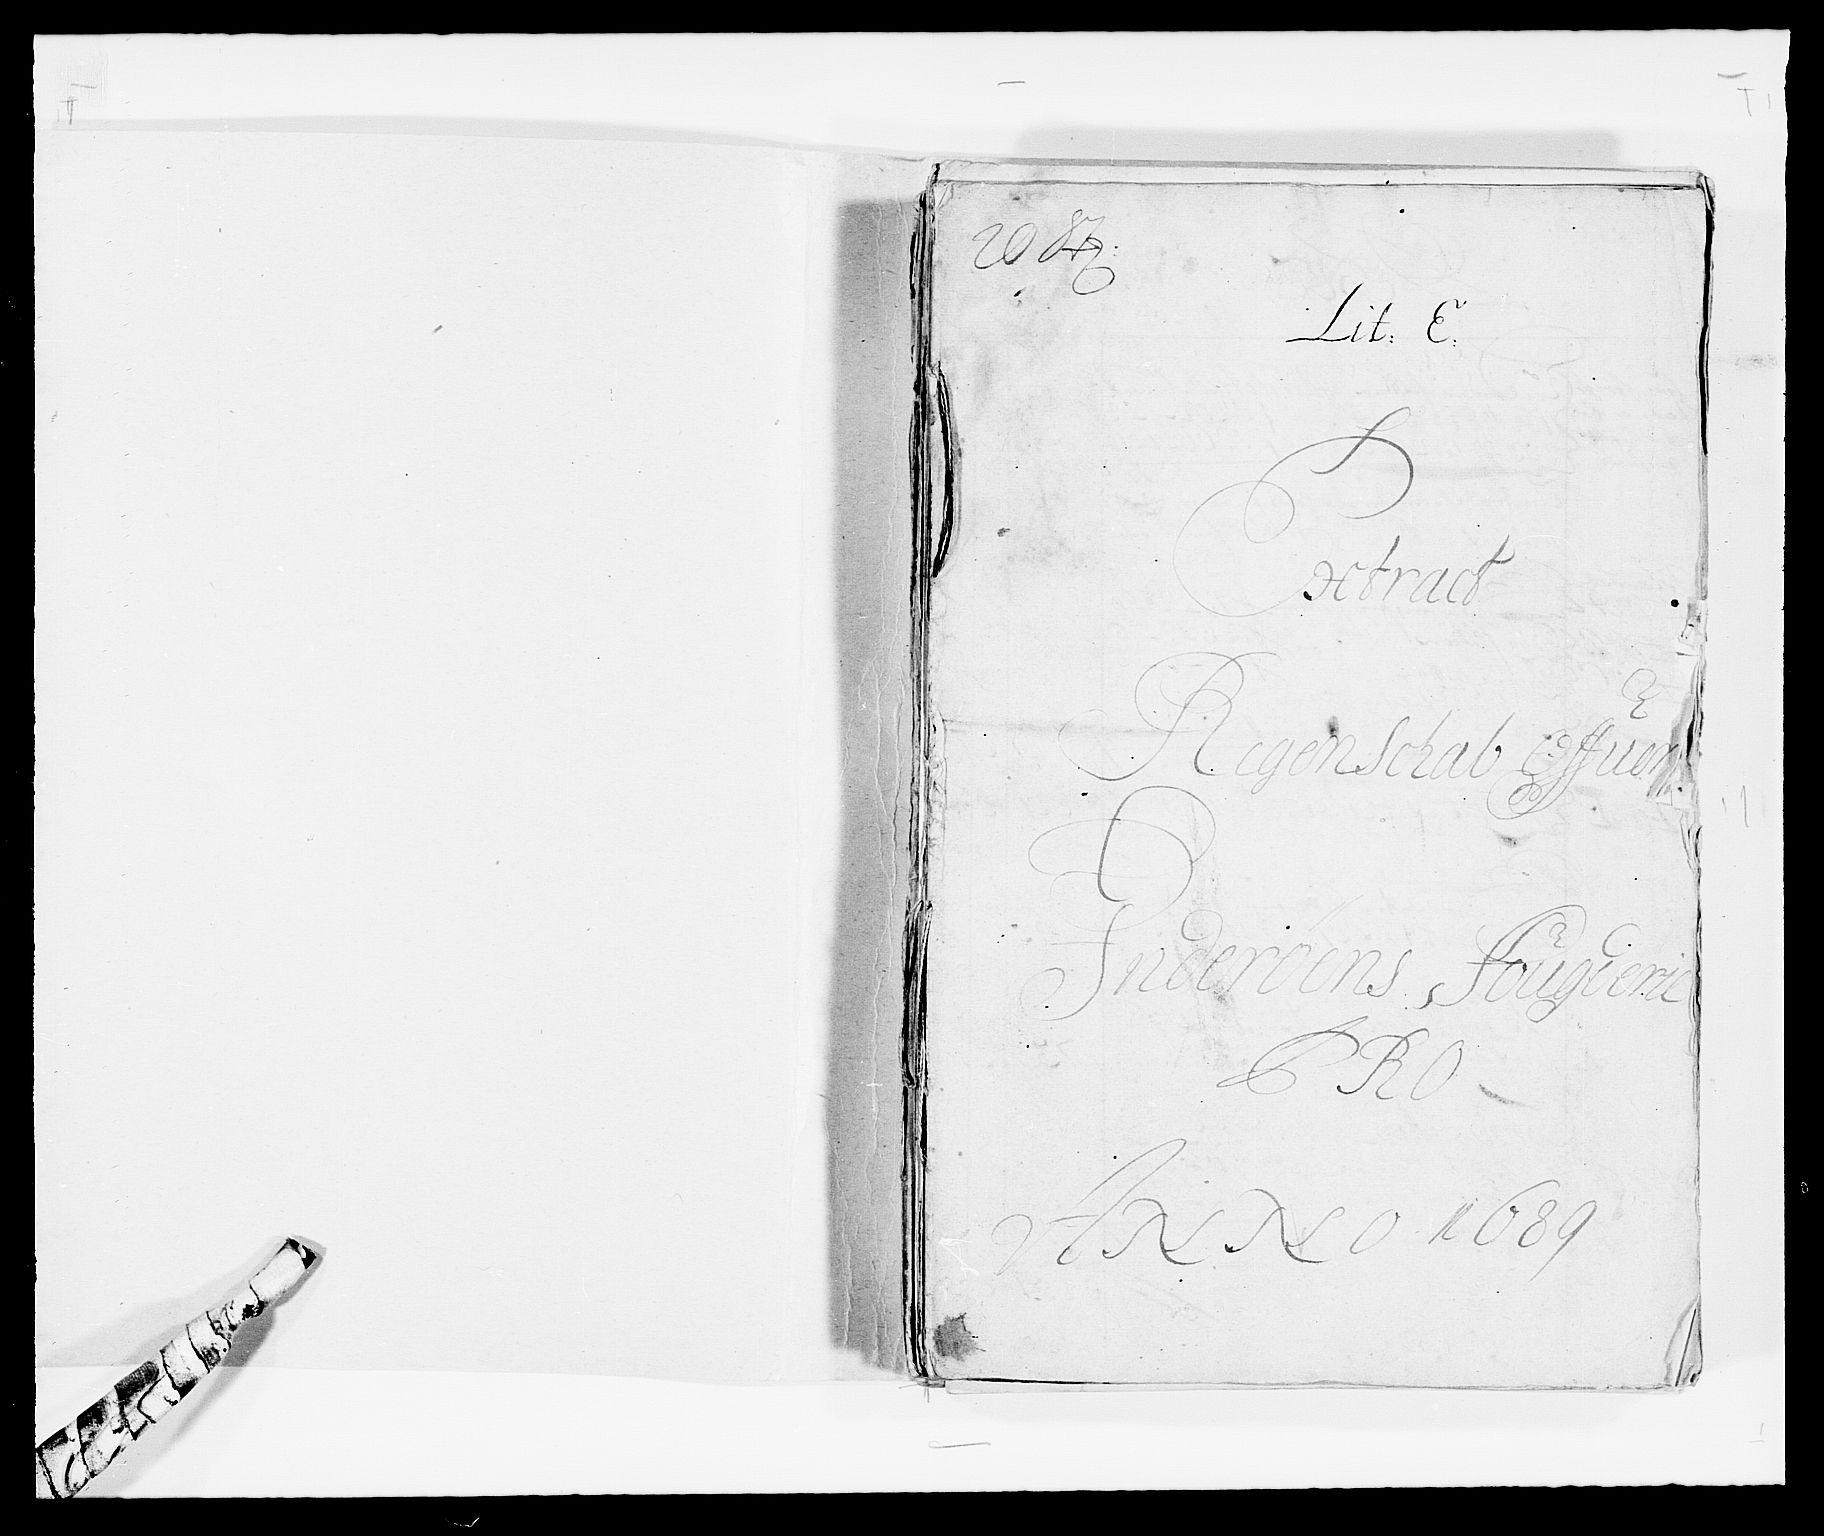 RA, Rentekammeret inntil 1814, Reviderte regnskaper, Fogderegnskap, R63/L4306: Fogderegnskap Inderøy, 1687-1689, s. 386